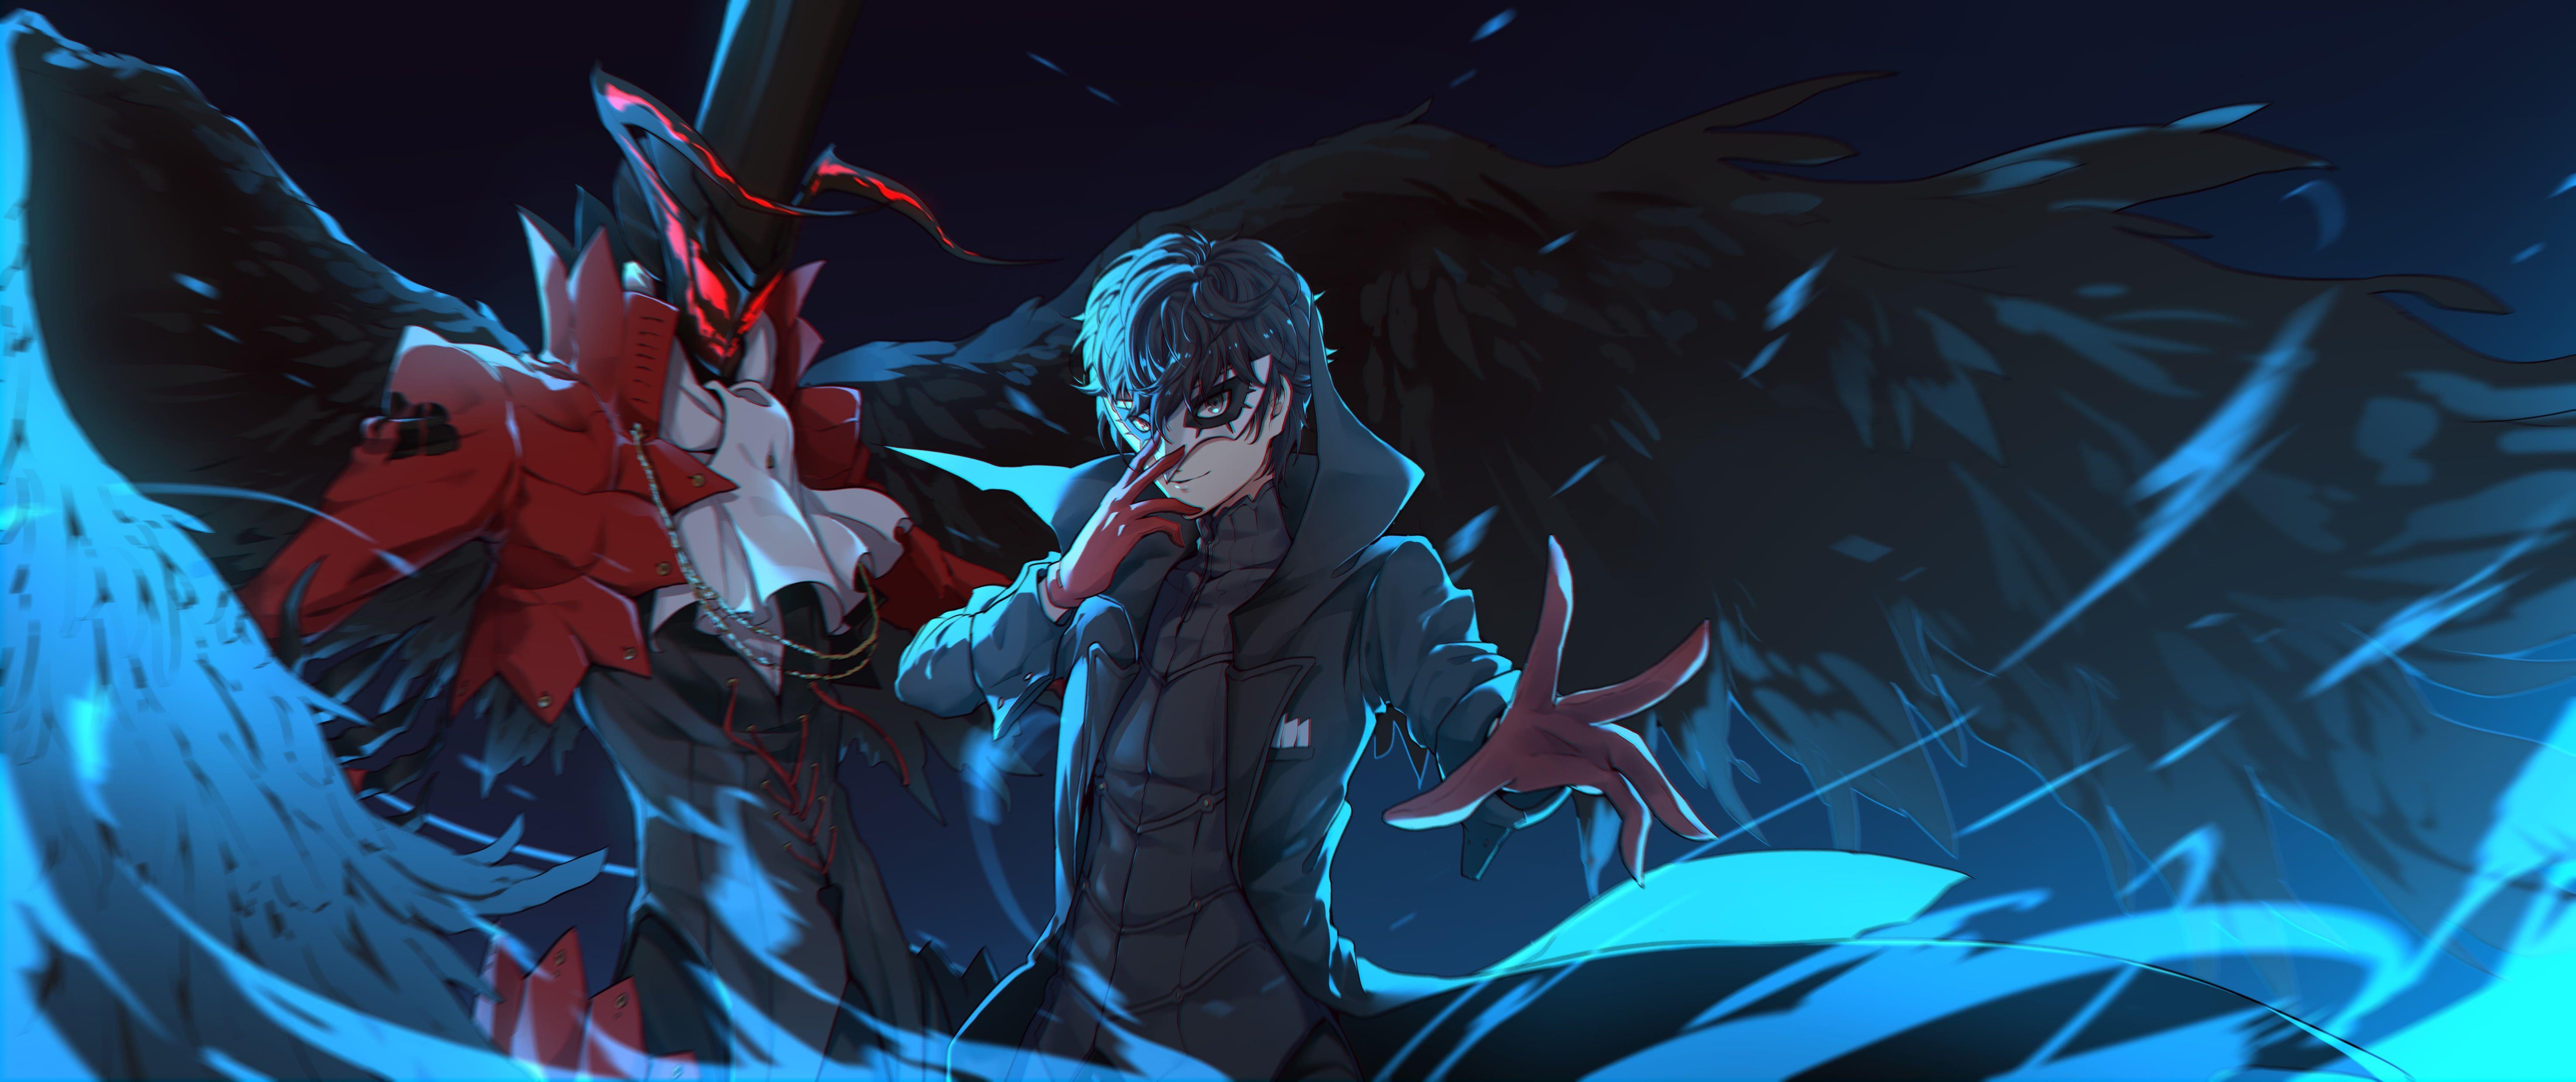 Anime Persona 5 The Animation Akira Kurusu 5k Wallpaper Hdwallpaper Desktop In 2020 Persona 5 Anime Persona 5 Persona